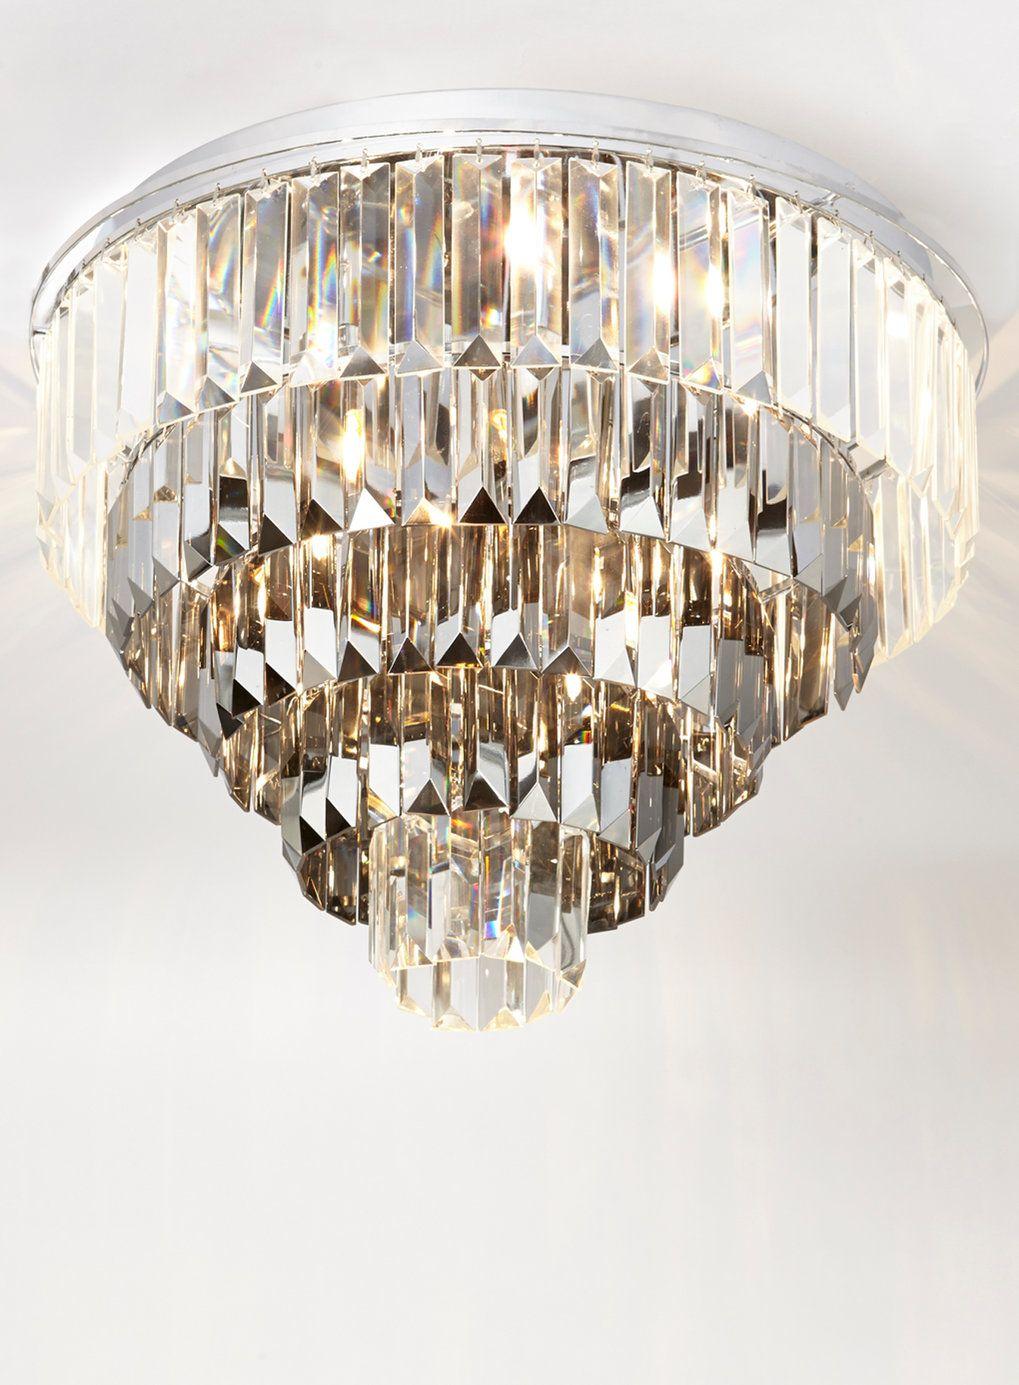 Marcella flushChrome and Crystal Marcella Flush Ceiling Light ...